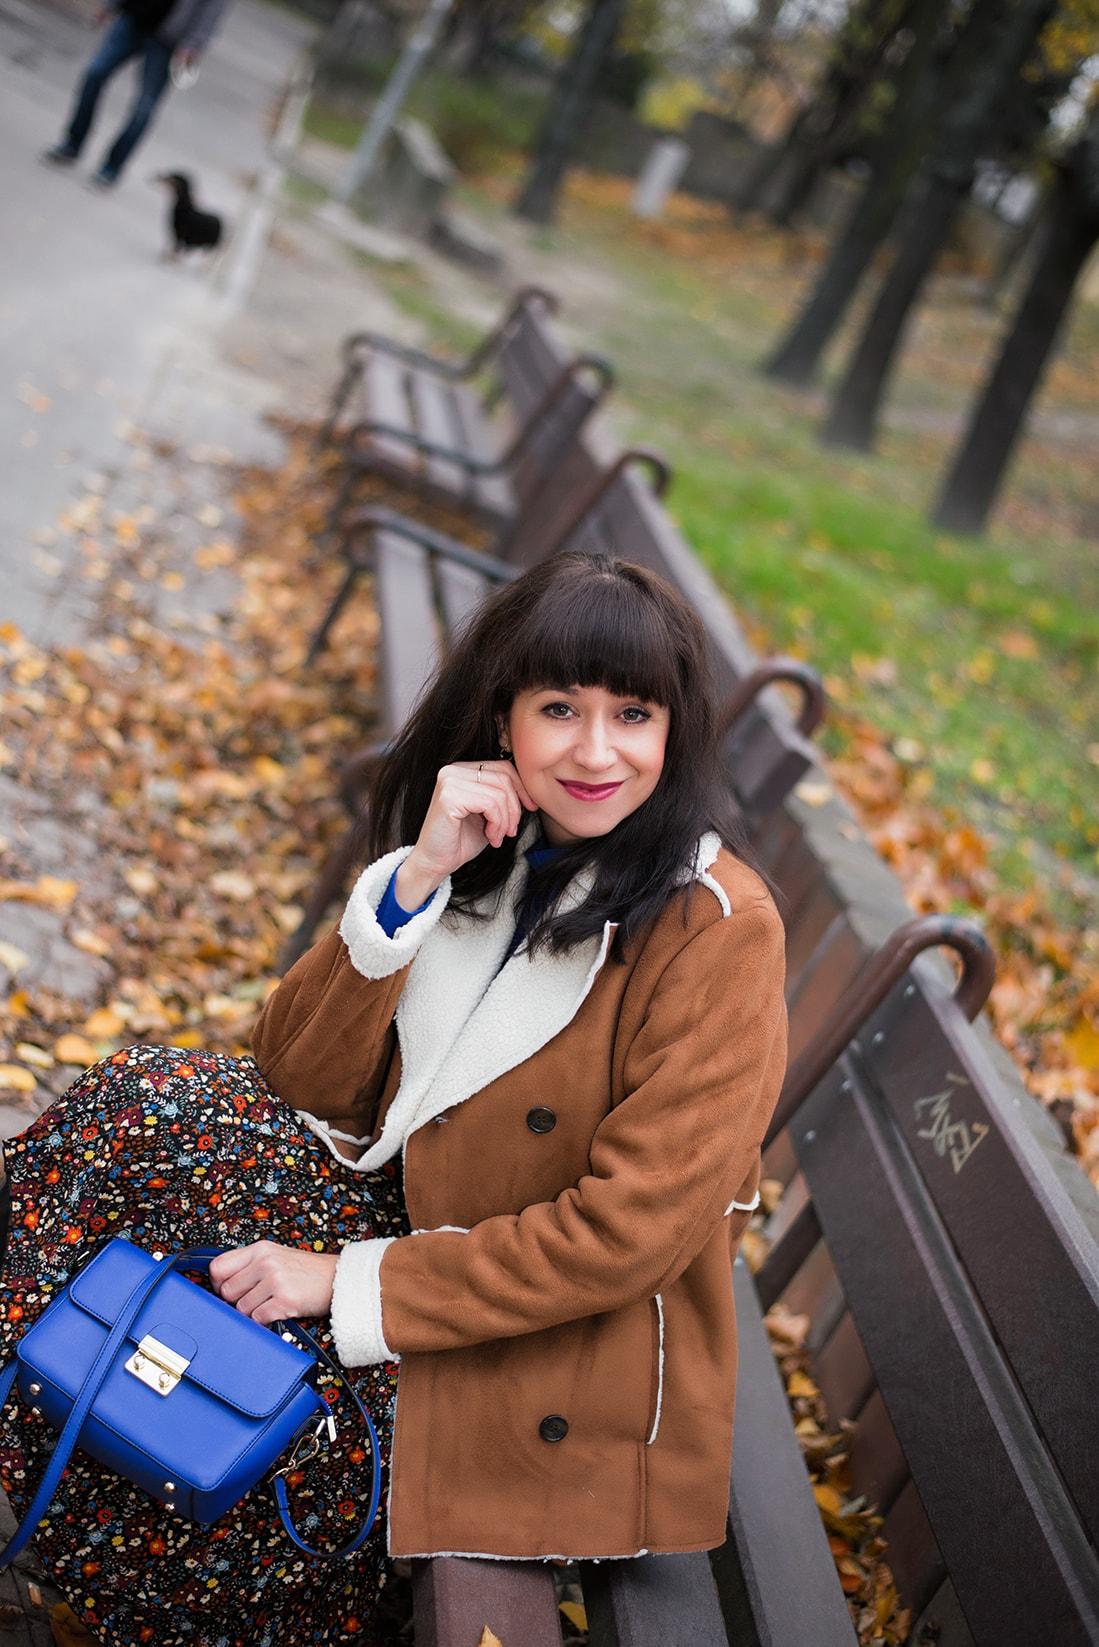 V NOWOM TARGU A SEMIŠOVÁ BUNDA NIELEN PRE BLOGERKU_Katharina-fashion is beautiful blog 6_Kvetovaná plisovaná sukňa_Kabelka JEJ_Katarína Jakubčová_Fashion blogerka